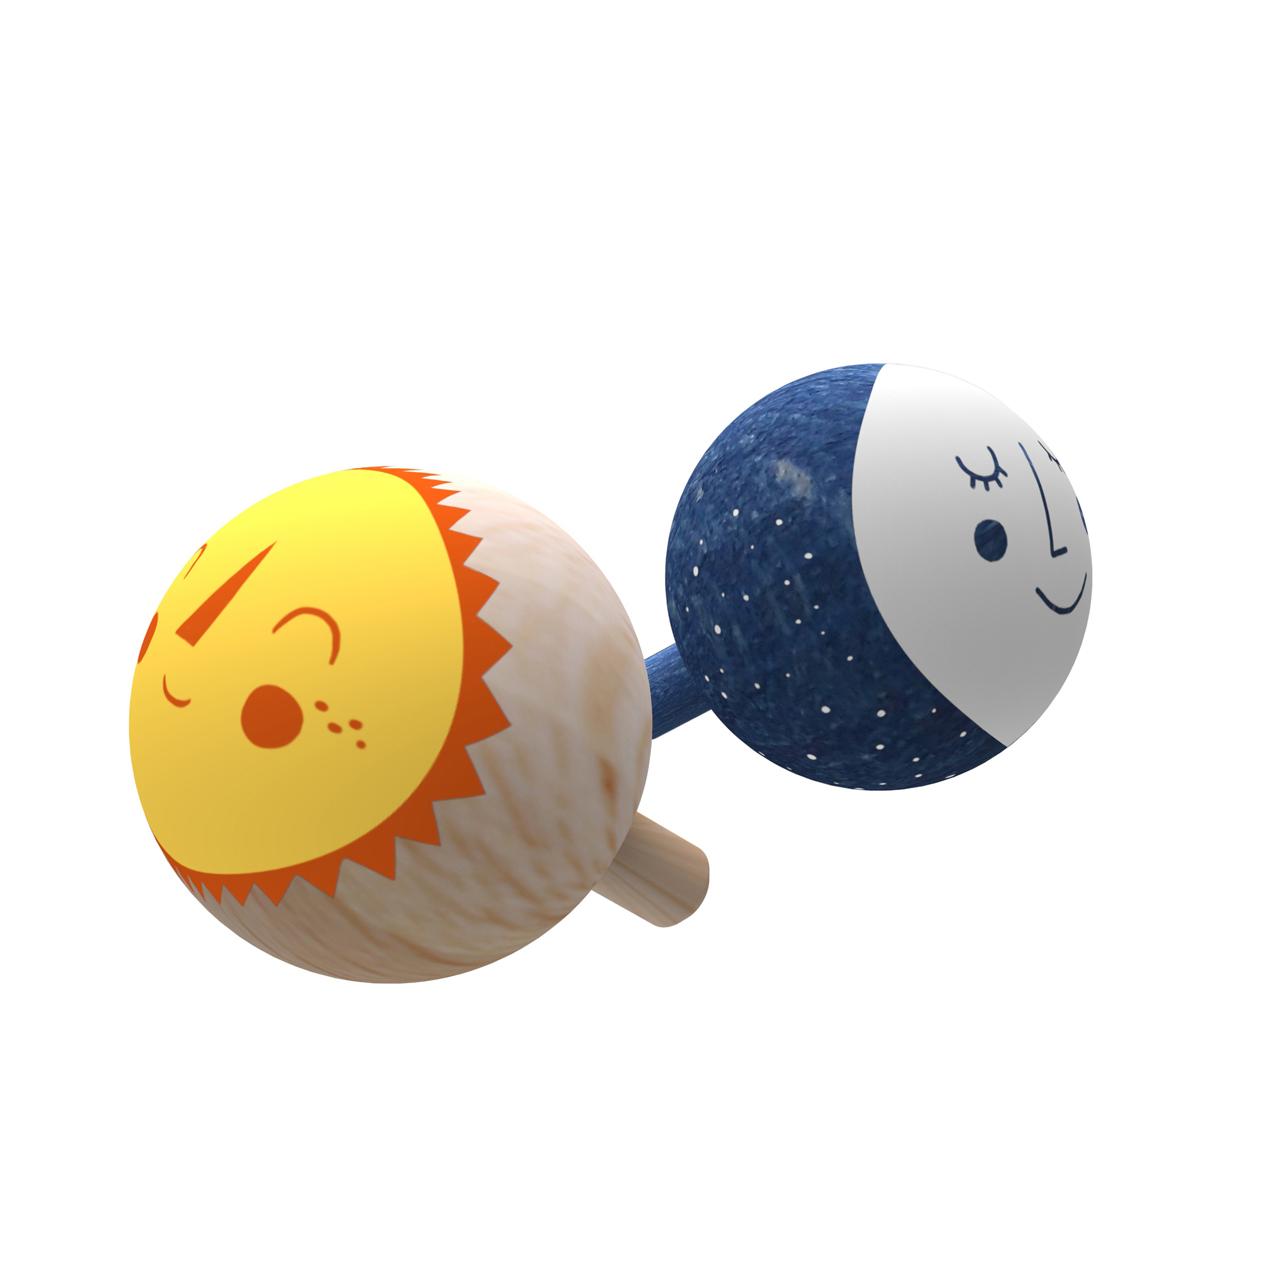 Londji Holz-Kreisel Wendekreisel Stehaufkreisel Umdrehkreisel Little Worlds - zuckerfrei | Kids Concept Store